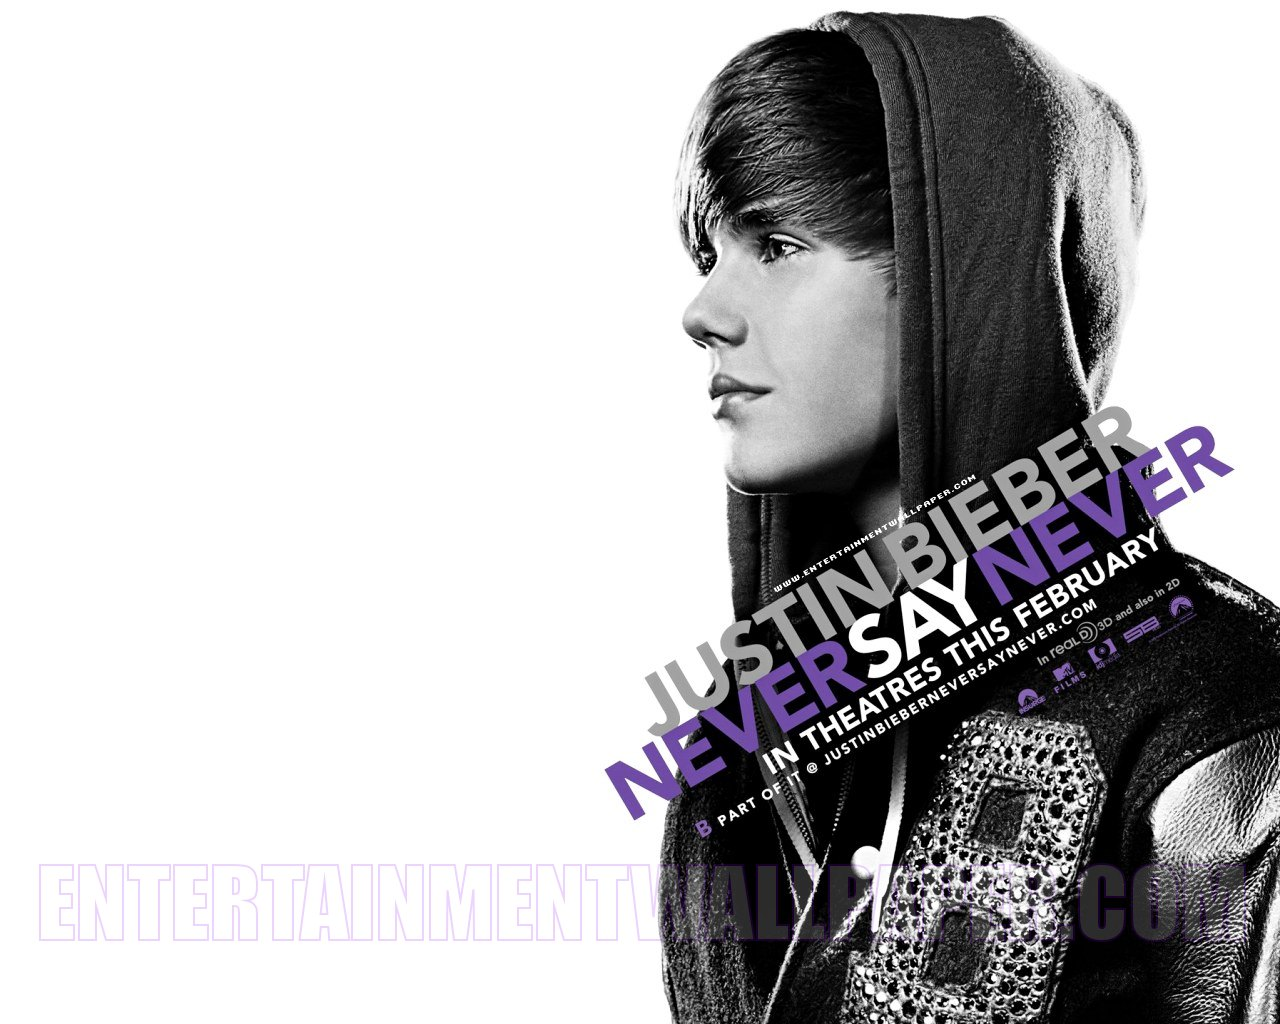 Justin Bieber Never Say Never wallpaper Download - justin bieber never say never wallpapers